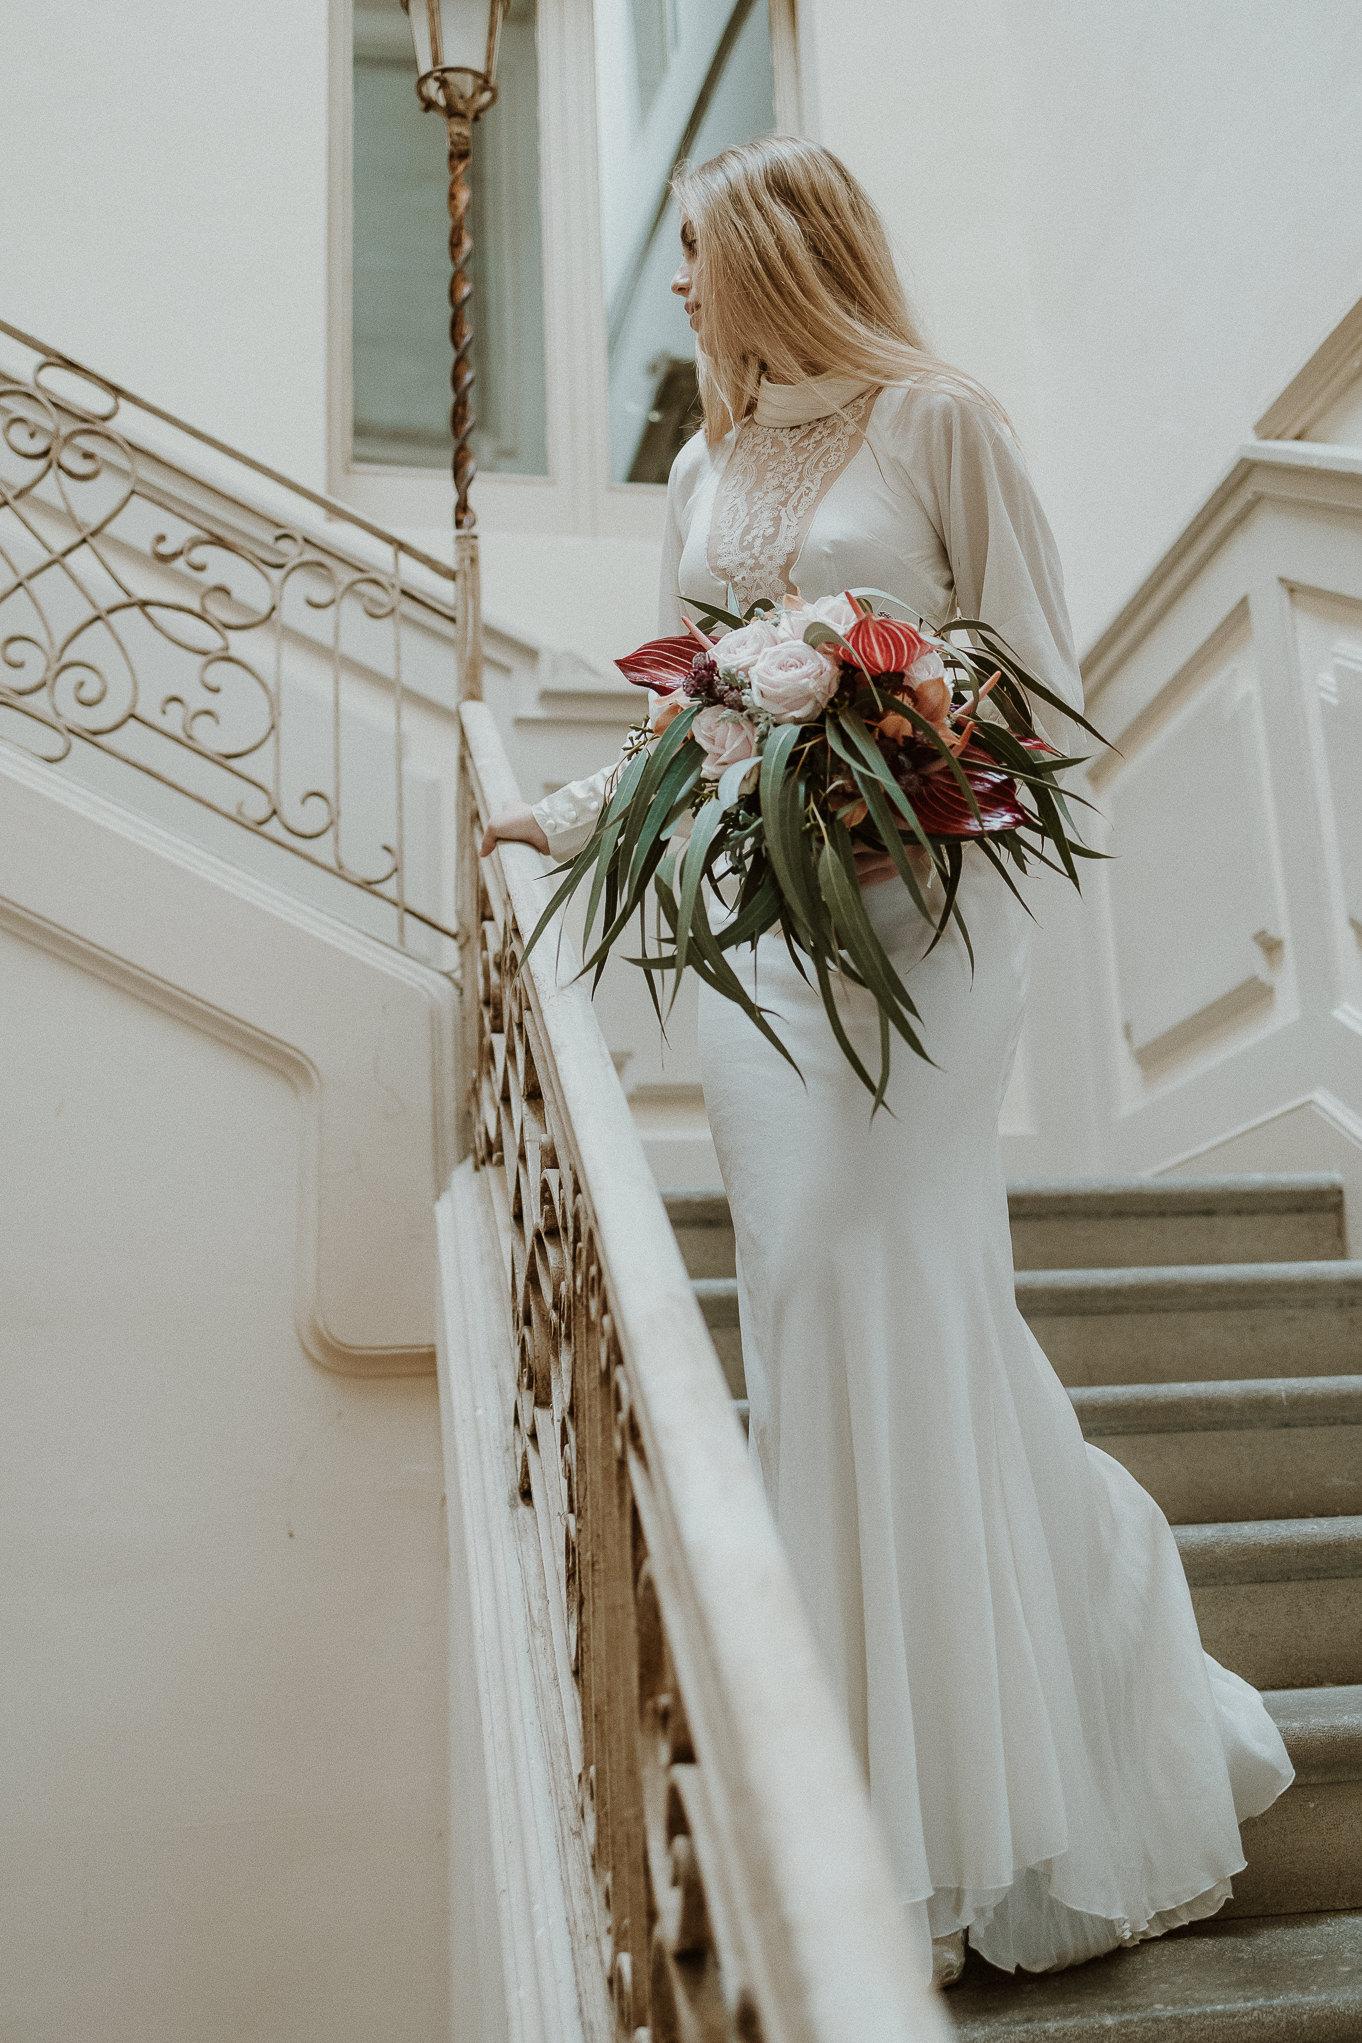 vestido de novia boho chic samsara, castell de caramany, bodas en girona, flores para bodas, flors jumel